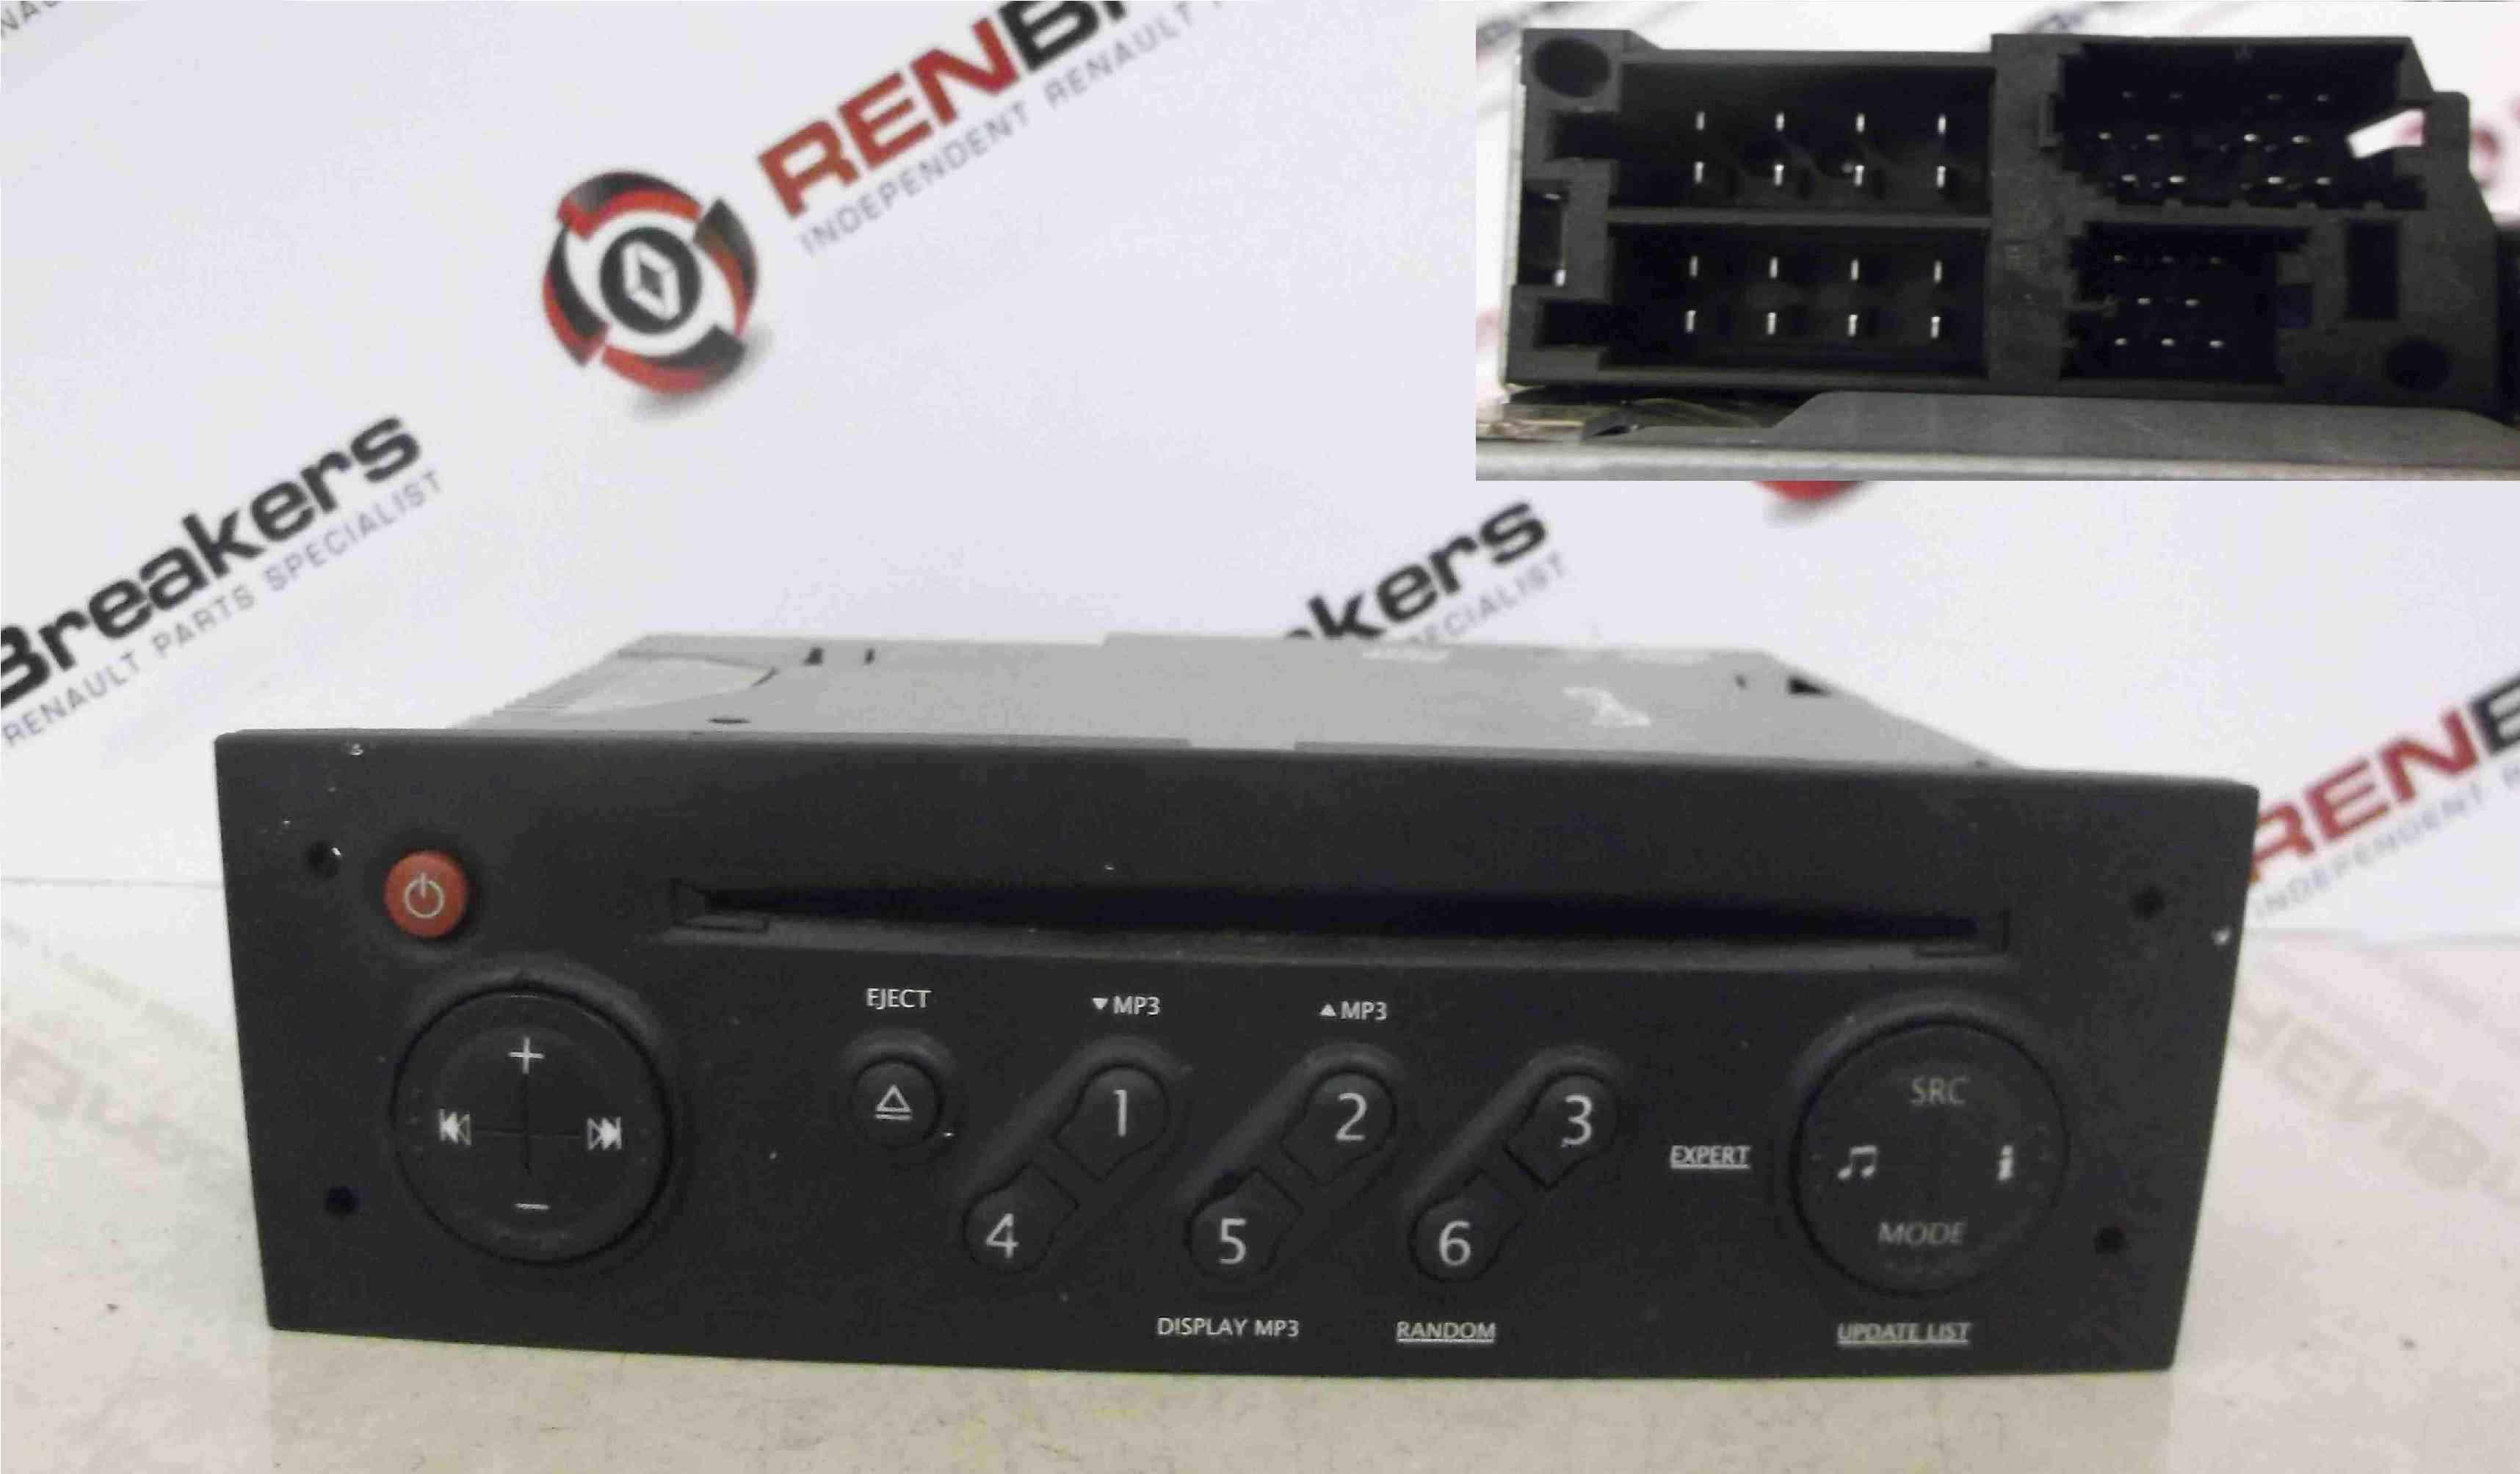 Renault Clio MK3 2005-2012 Radio Cd Player Update List MP3 + Code 8200633624